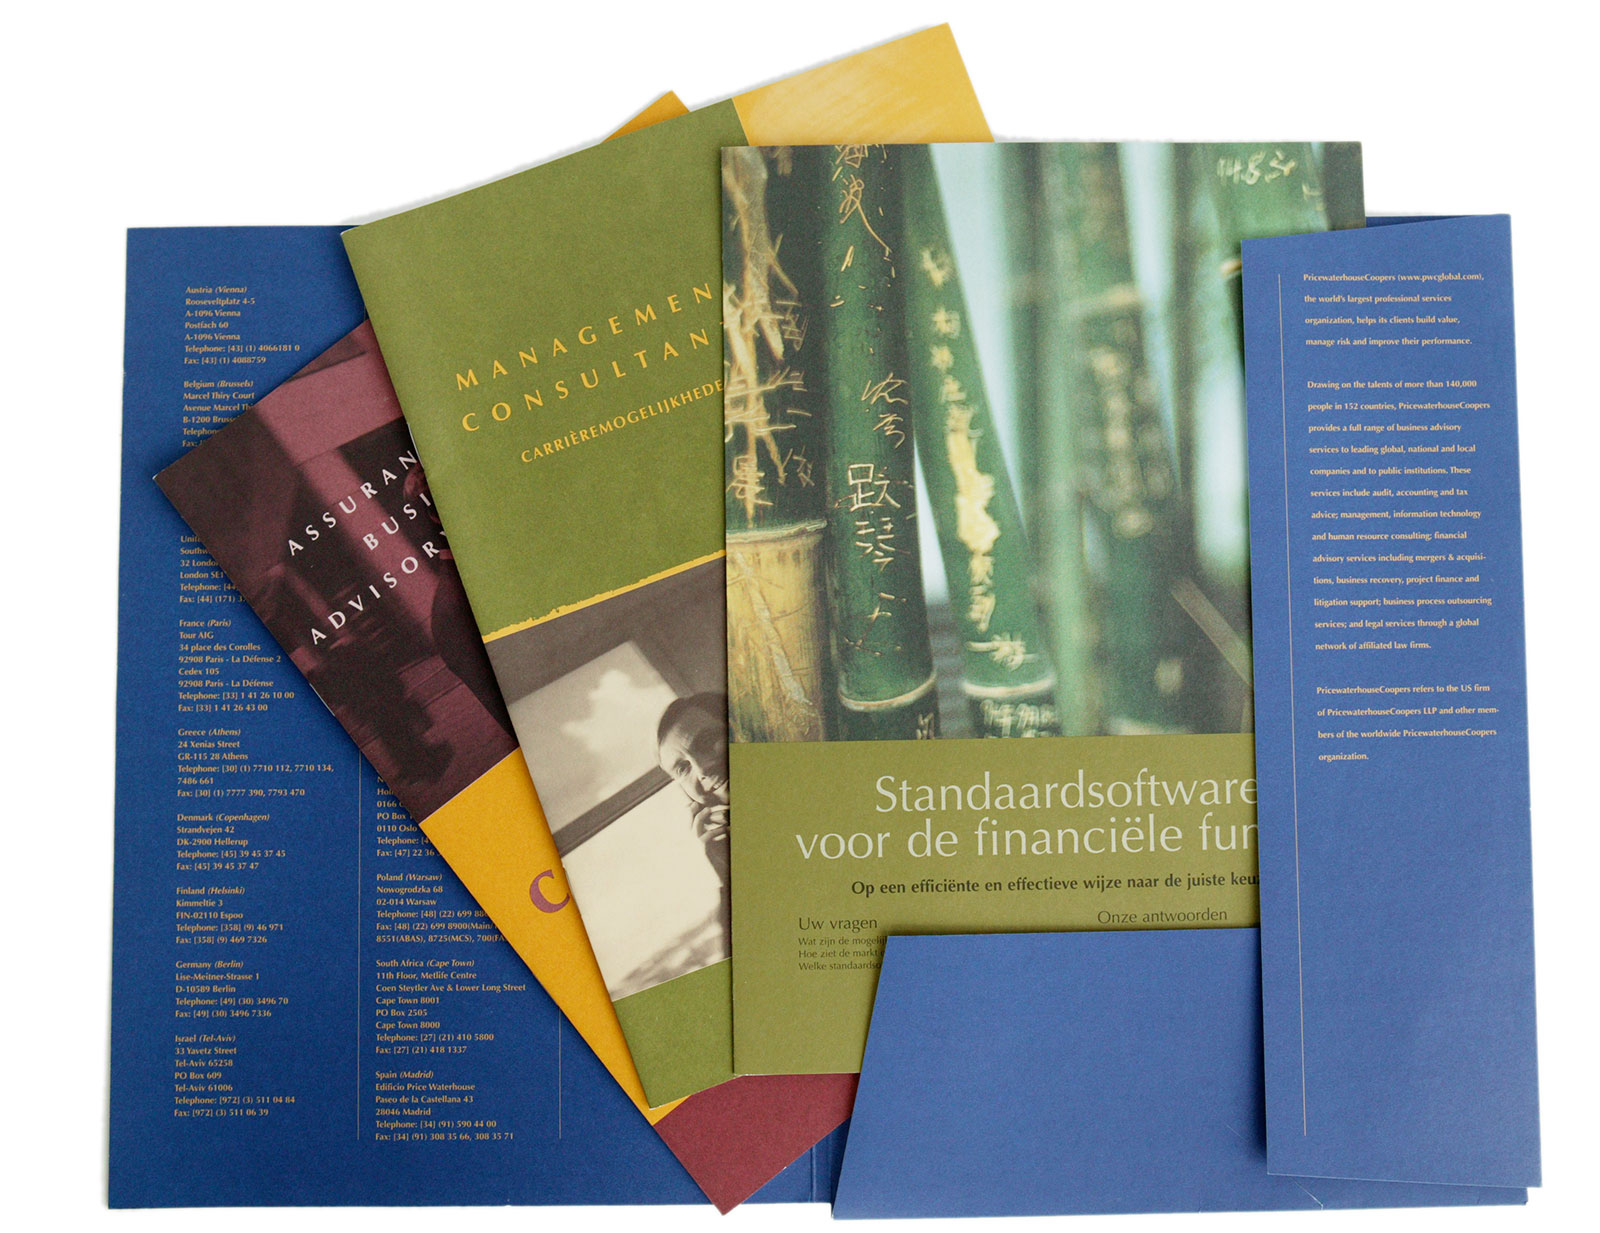 PricewaterhouseCoopers - Print Material